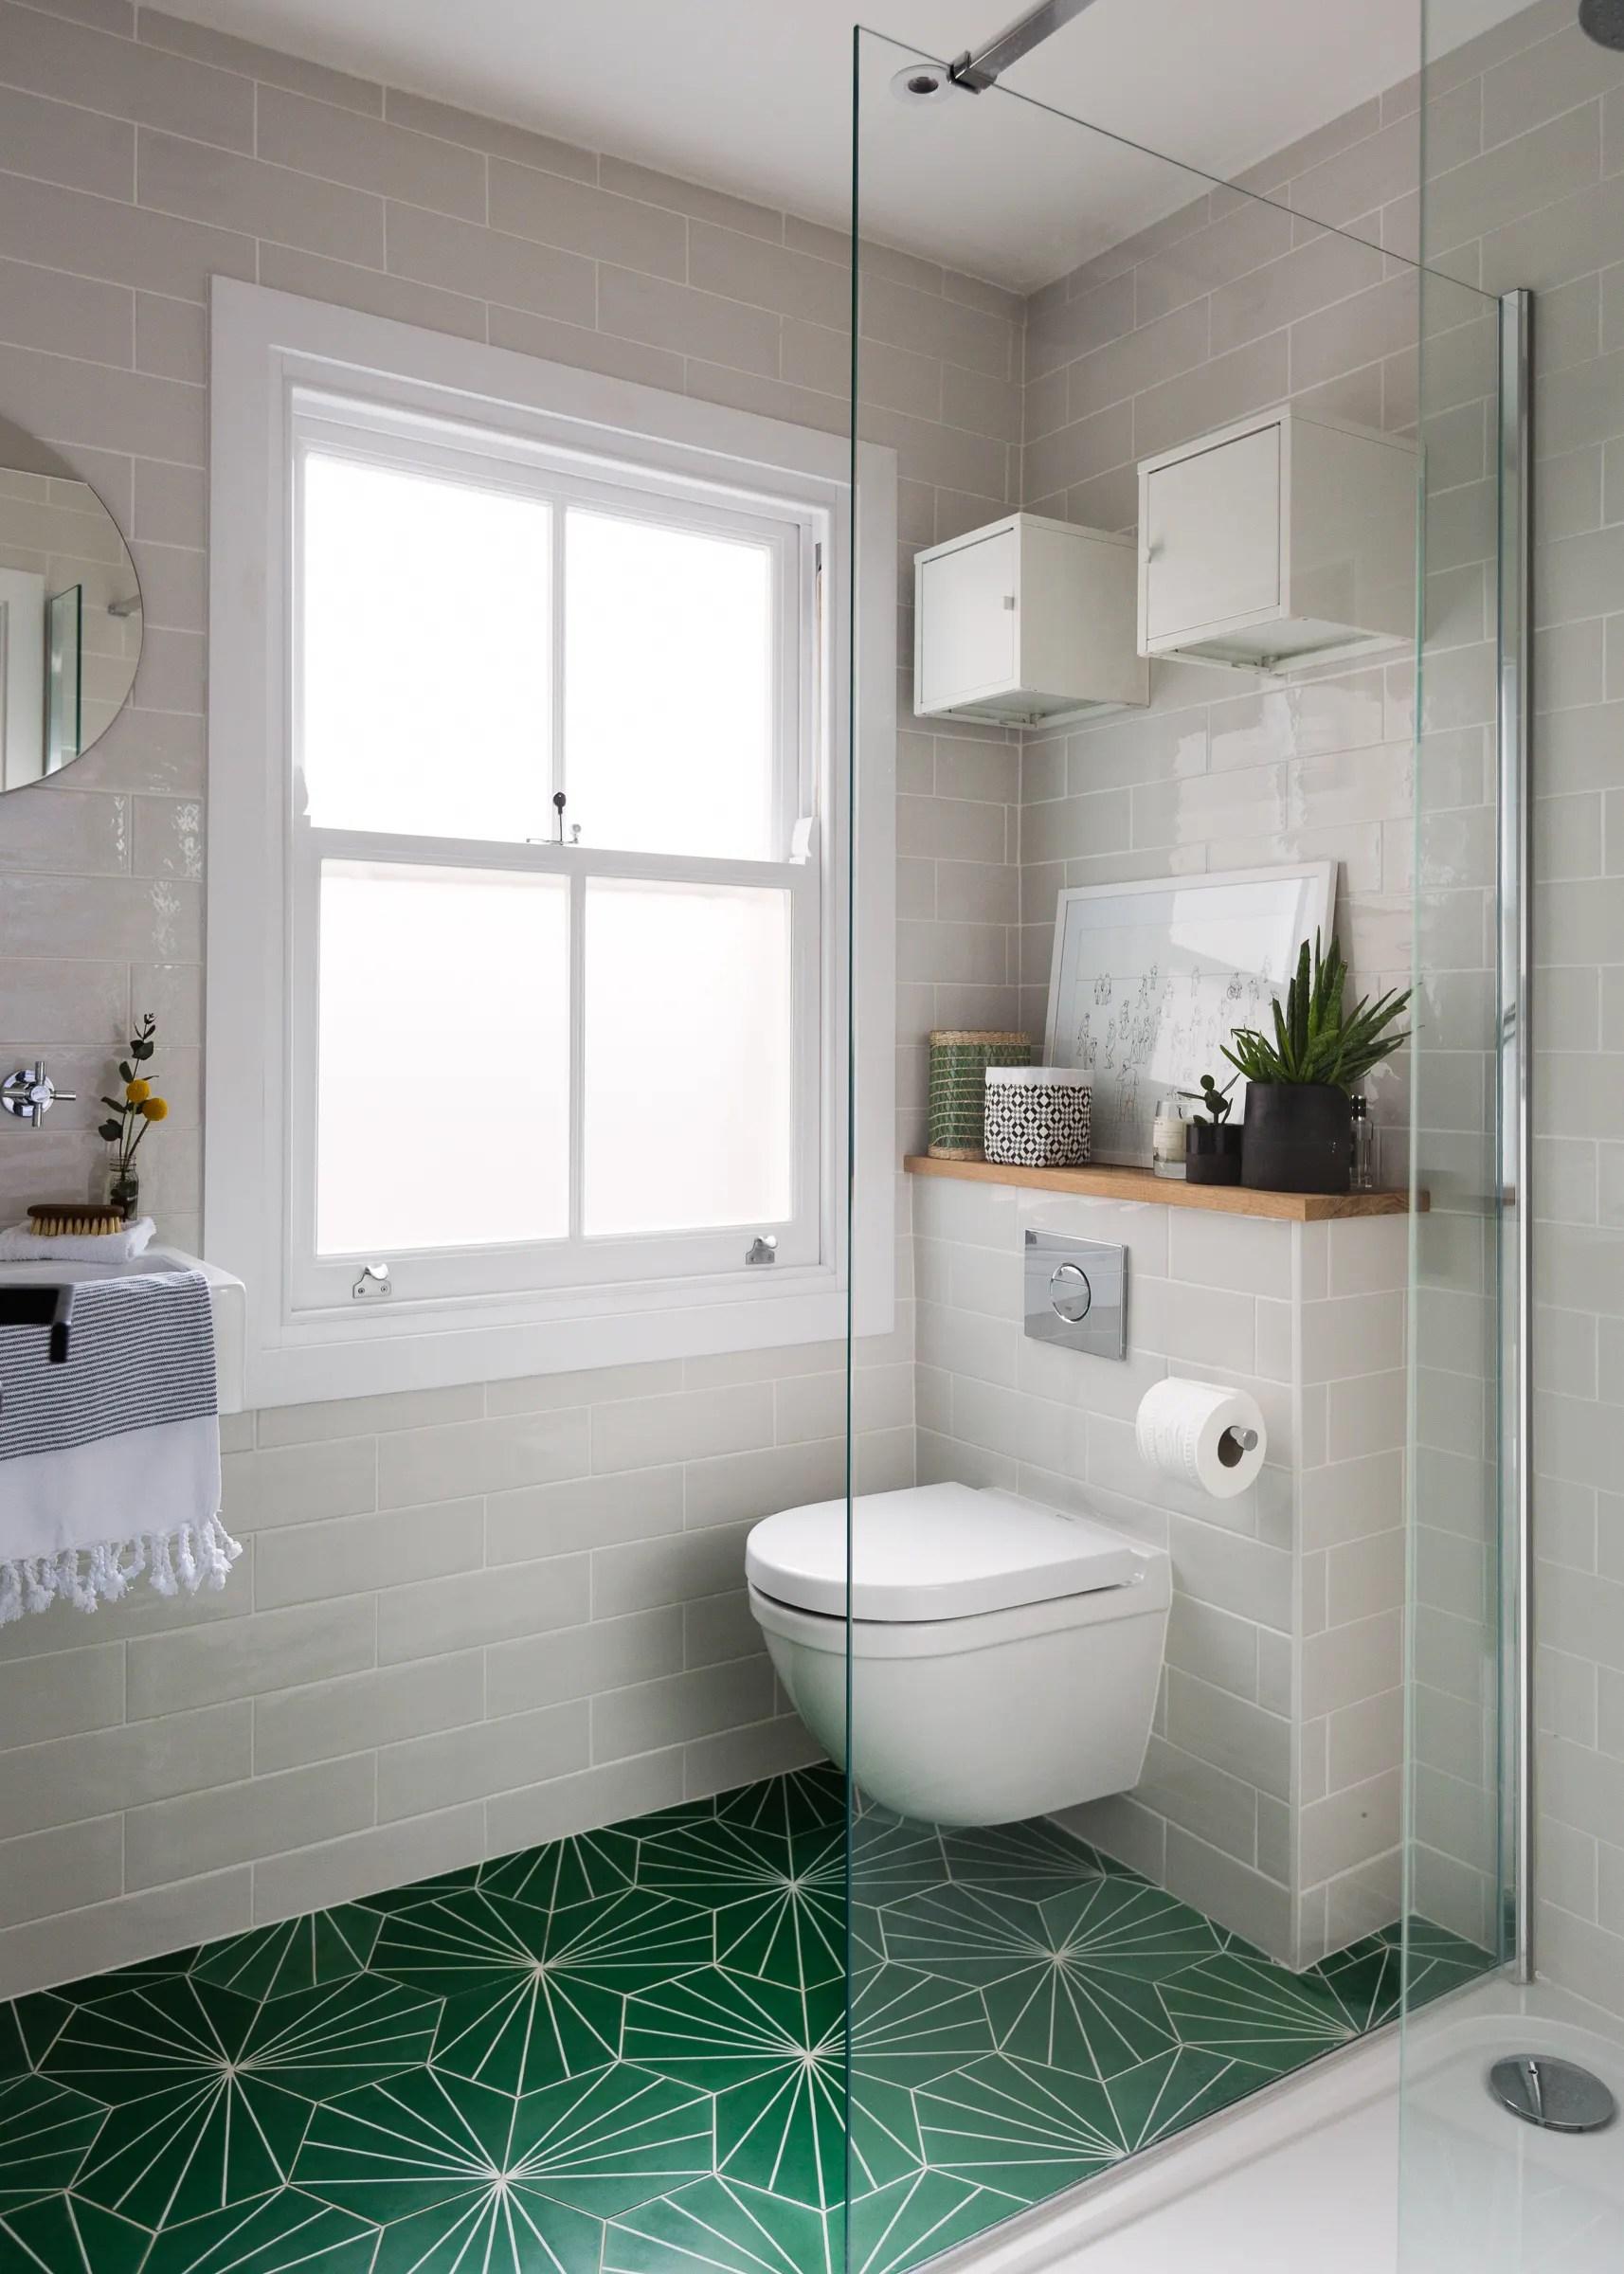 Bathroom Tile Ideas - Floor, Shower, Wall Designs ... on Bathroom Tile Designs  id=67466